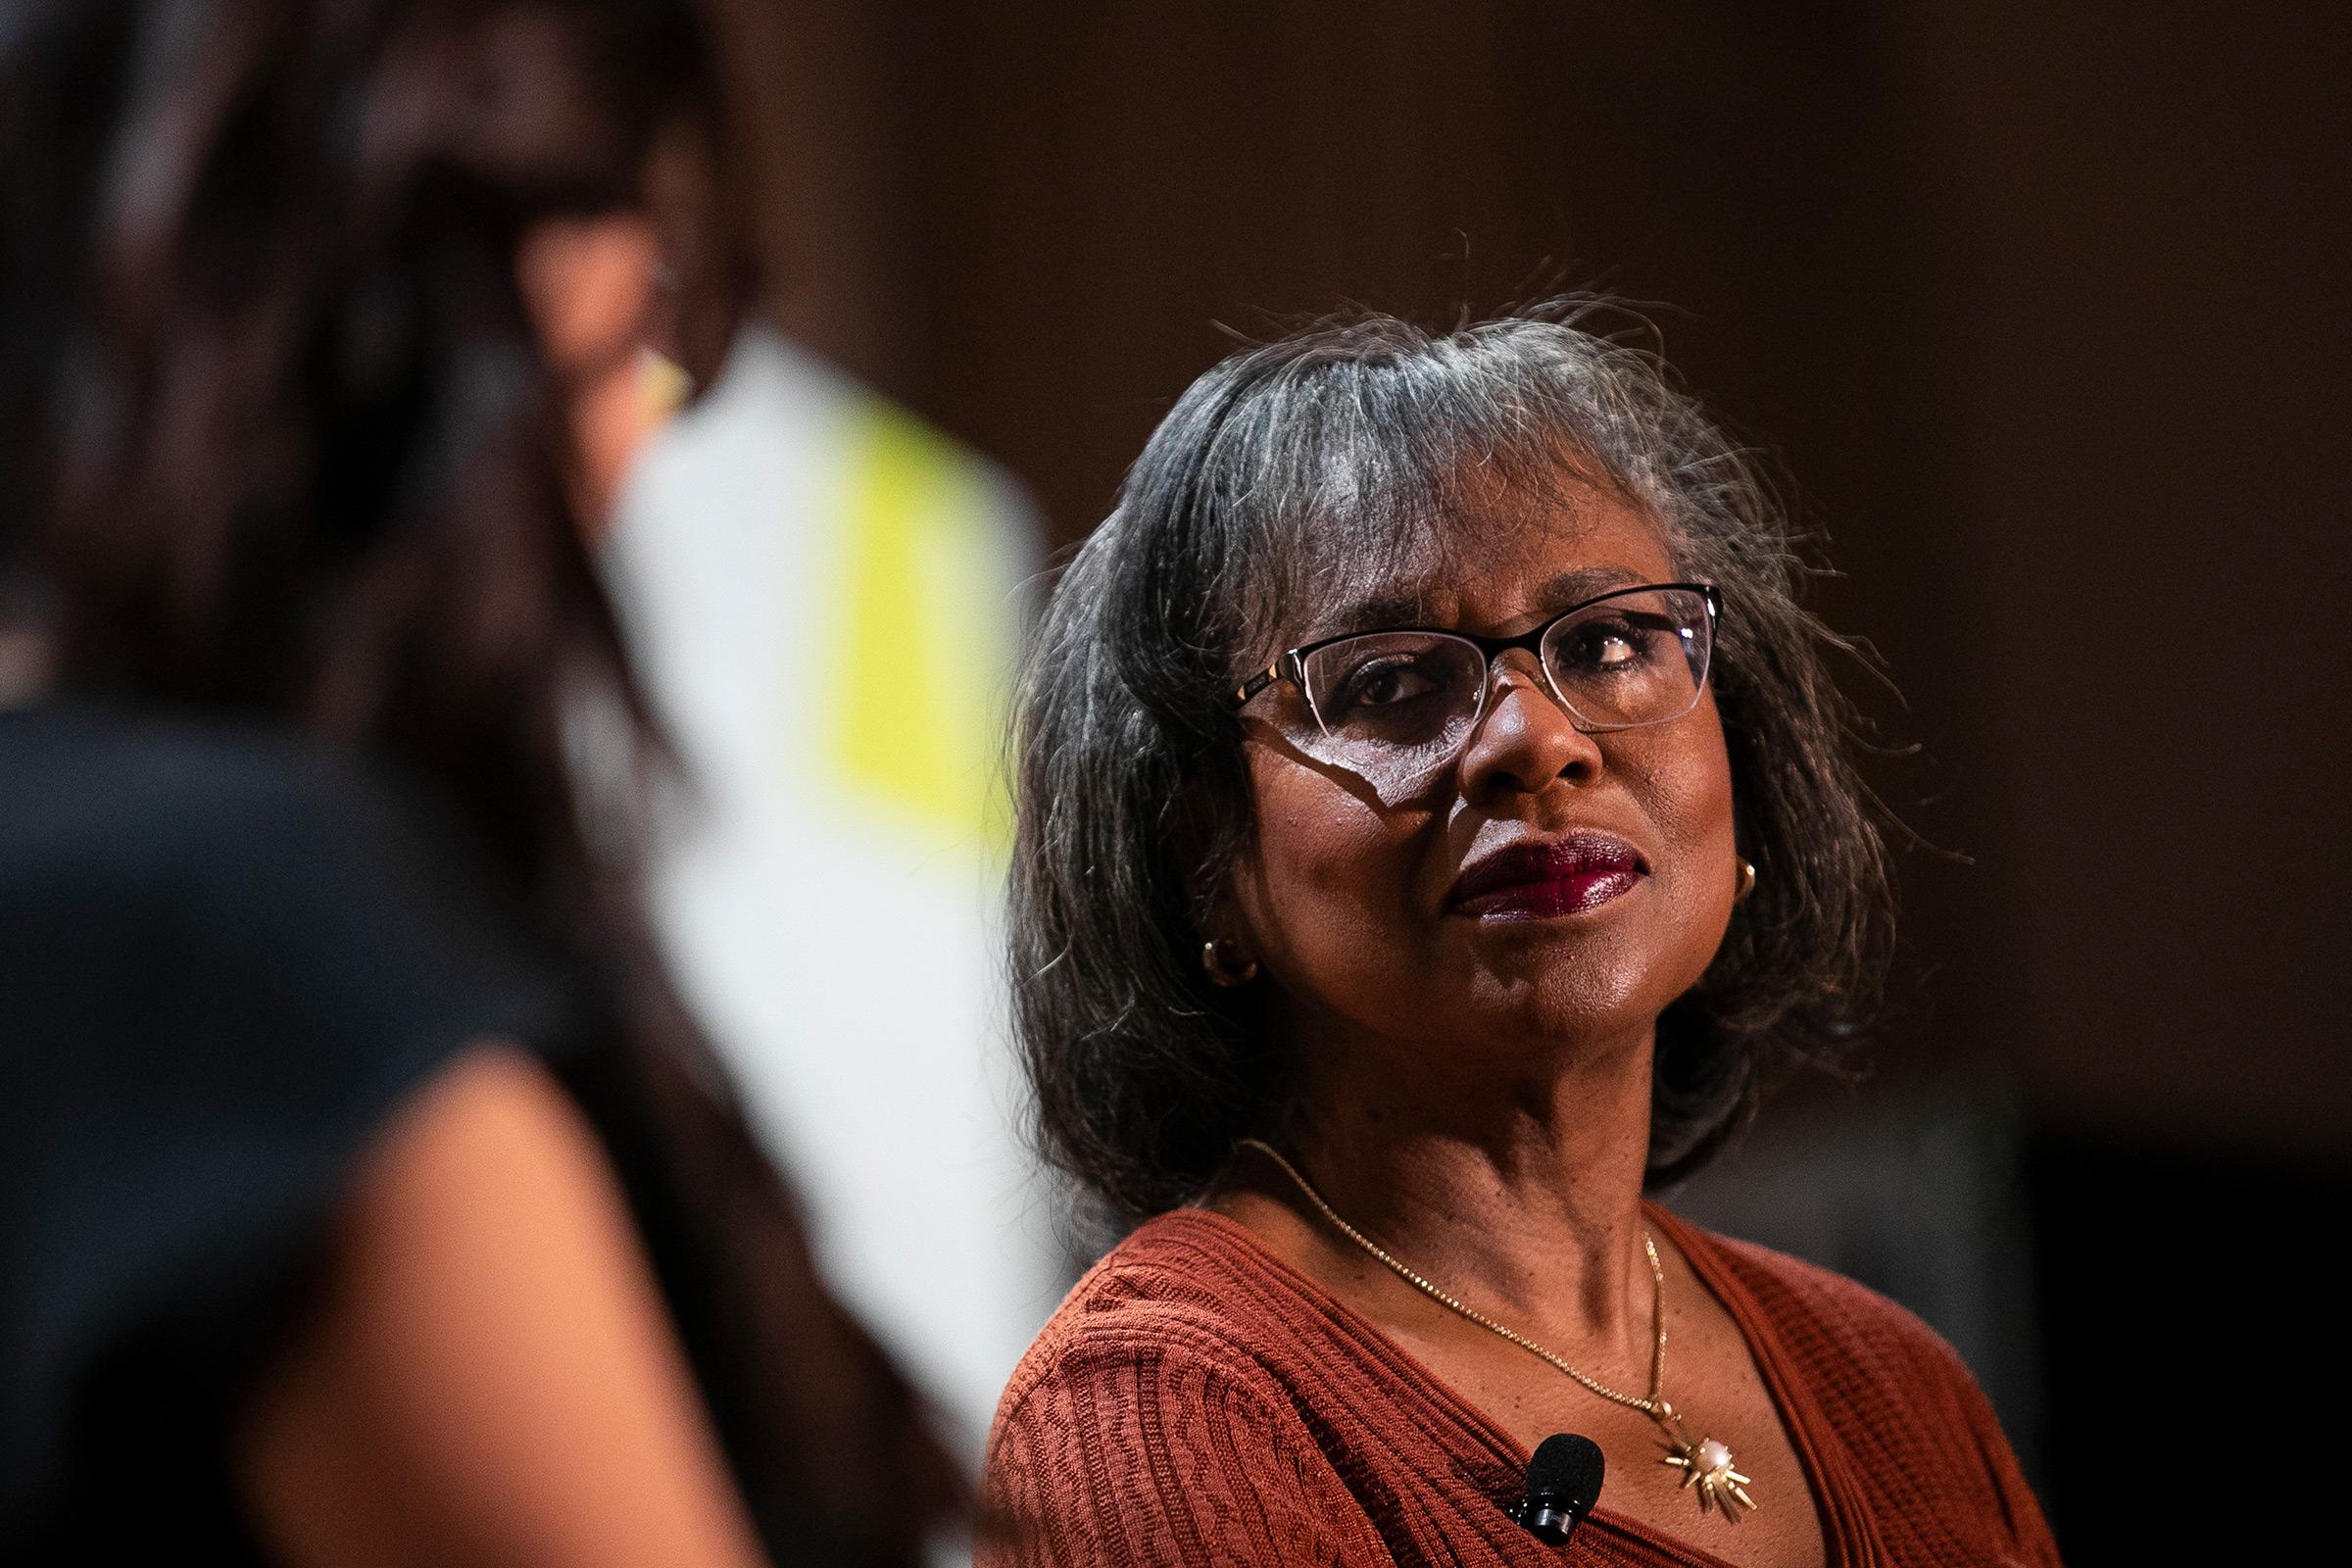 Anita Hill speaks during the New Rules Summit in Brooklyn, N.Y., on June 13, 2019.